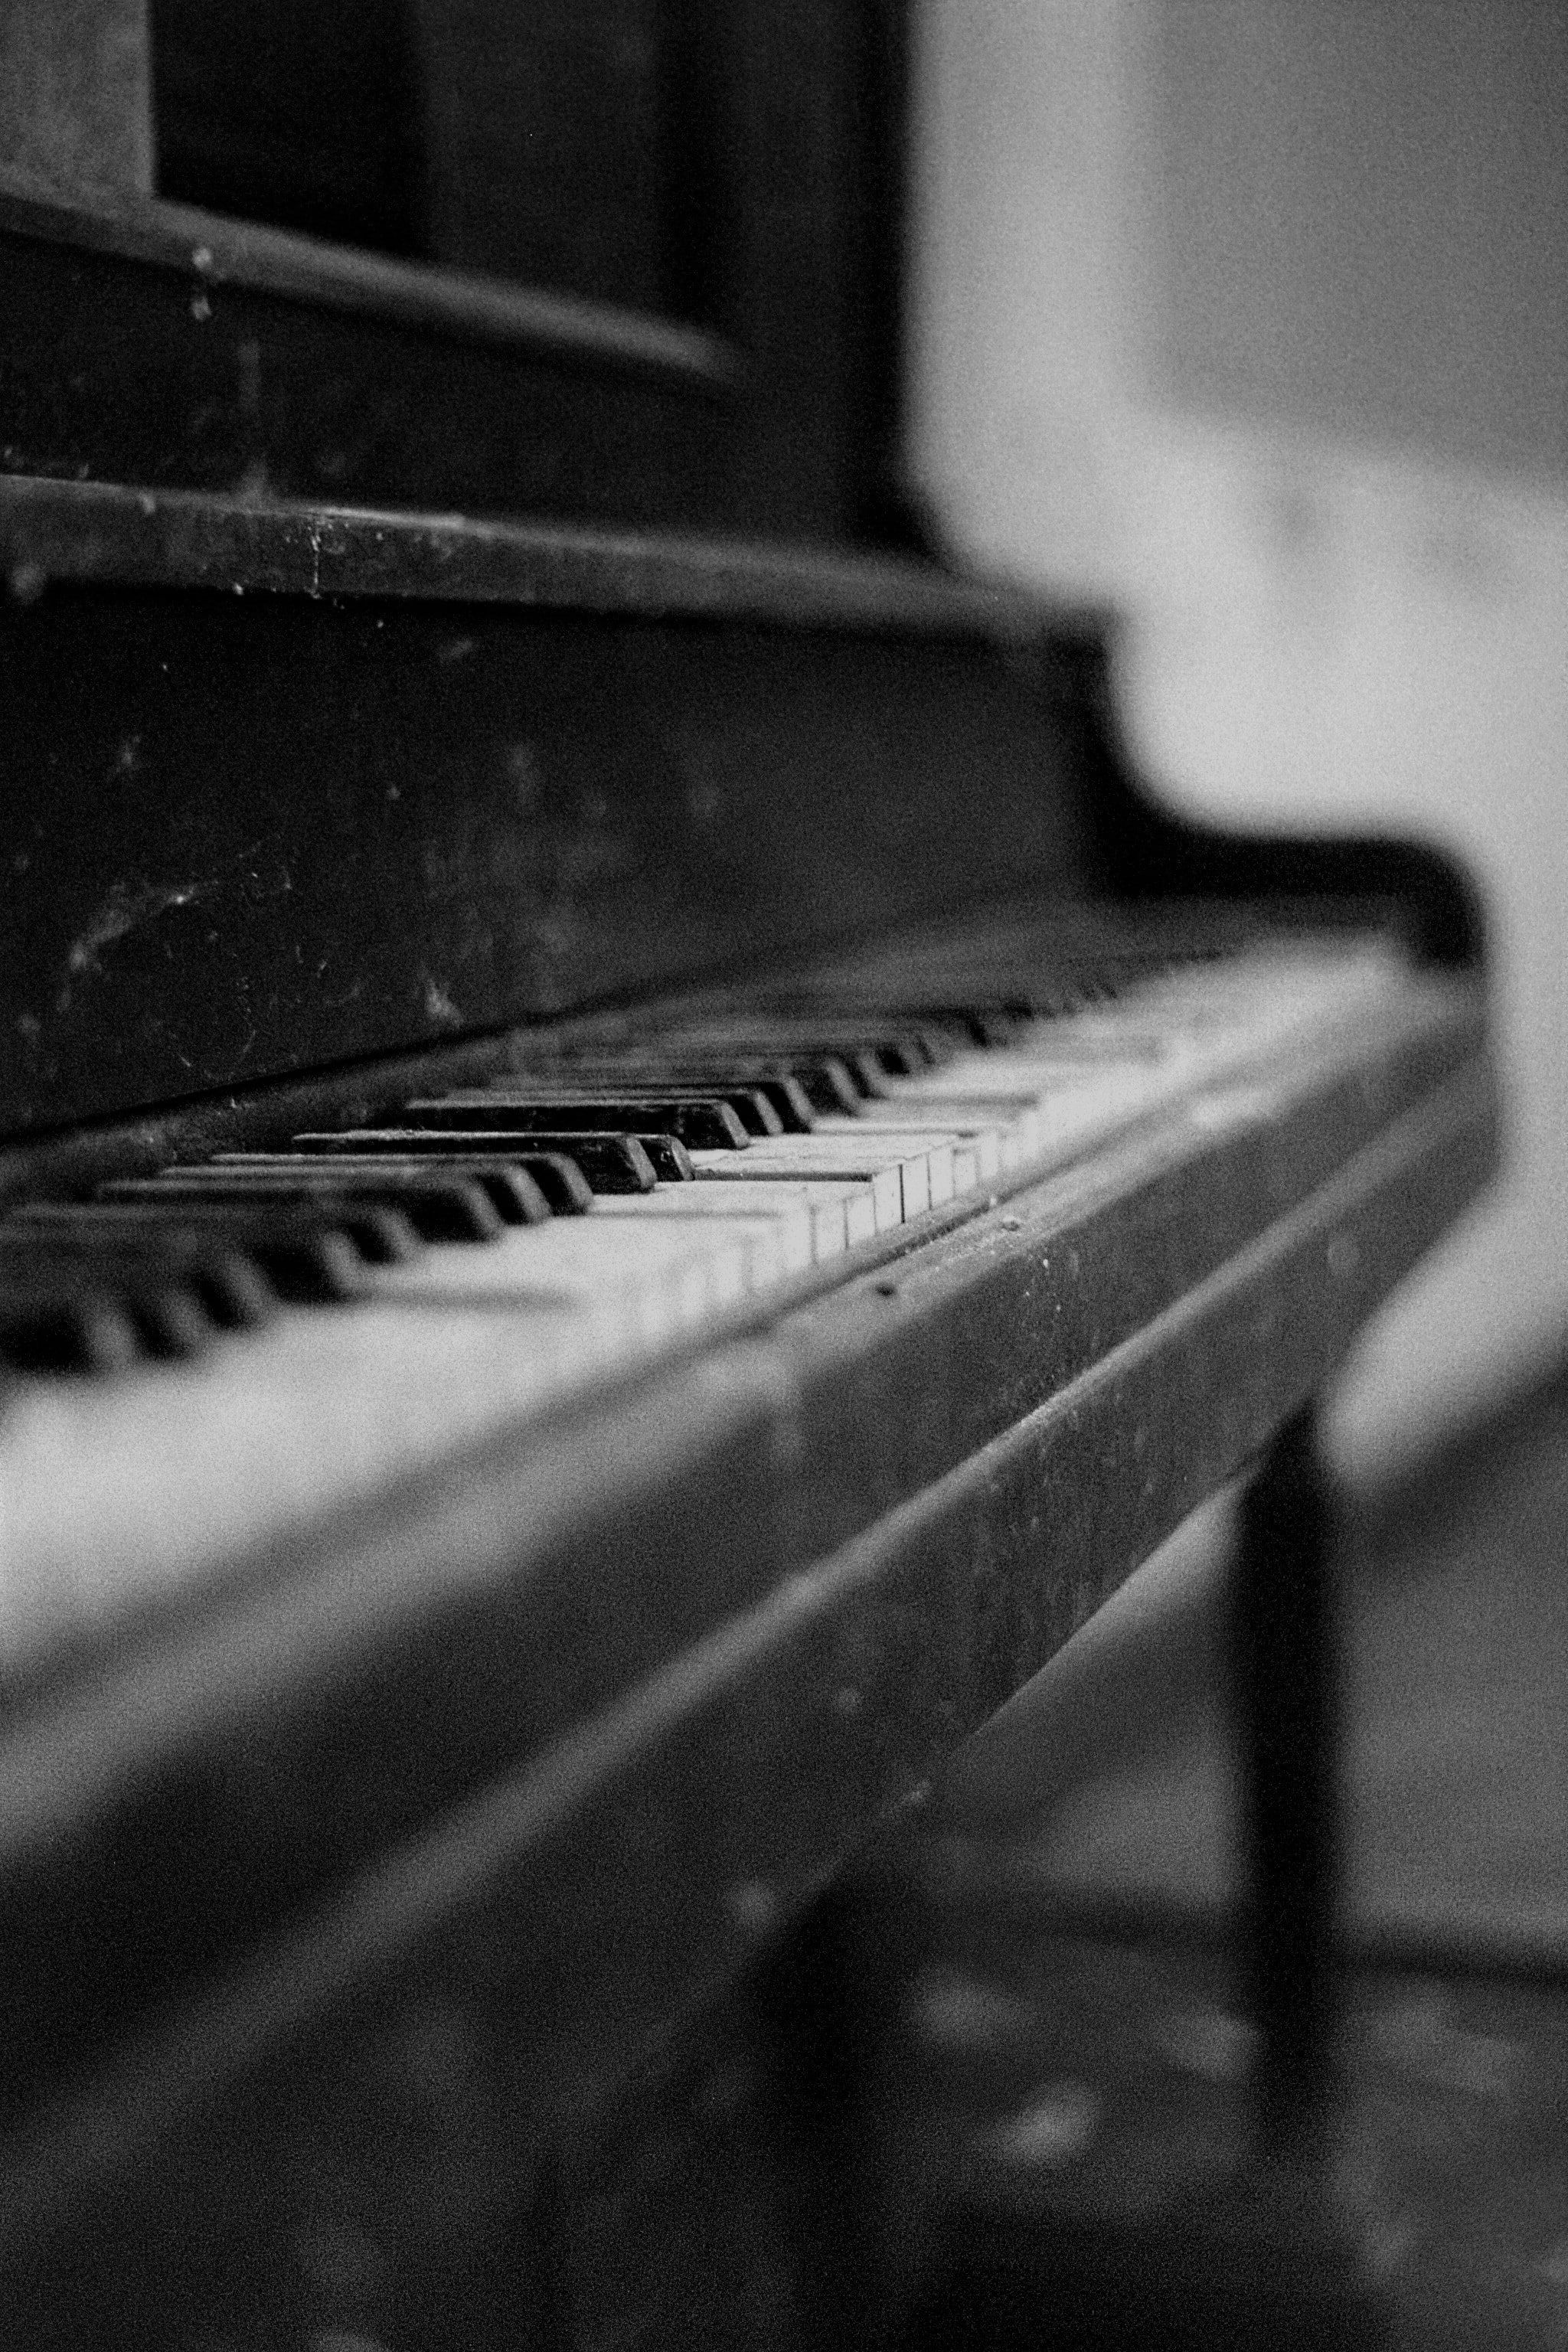 Monochrome Piano 2k Wallpaper Hdwallpaper Desktop Piano Hd Wallpaper Culture Art Hd wallpaper piano keys macro musical